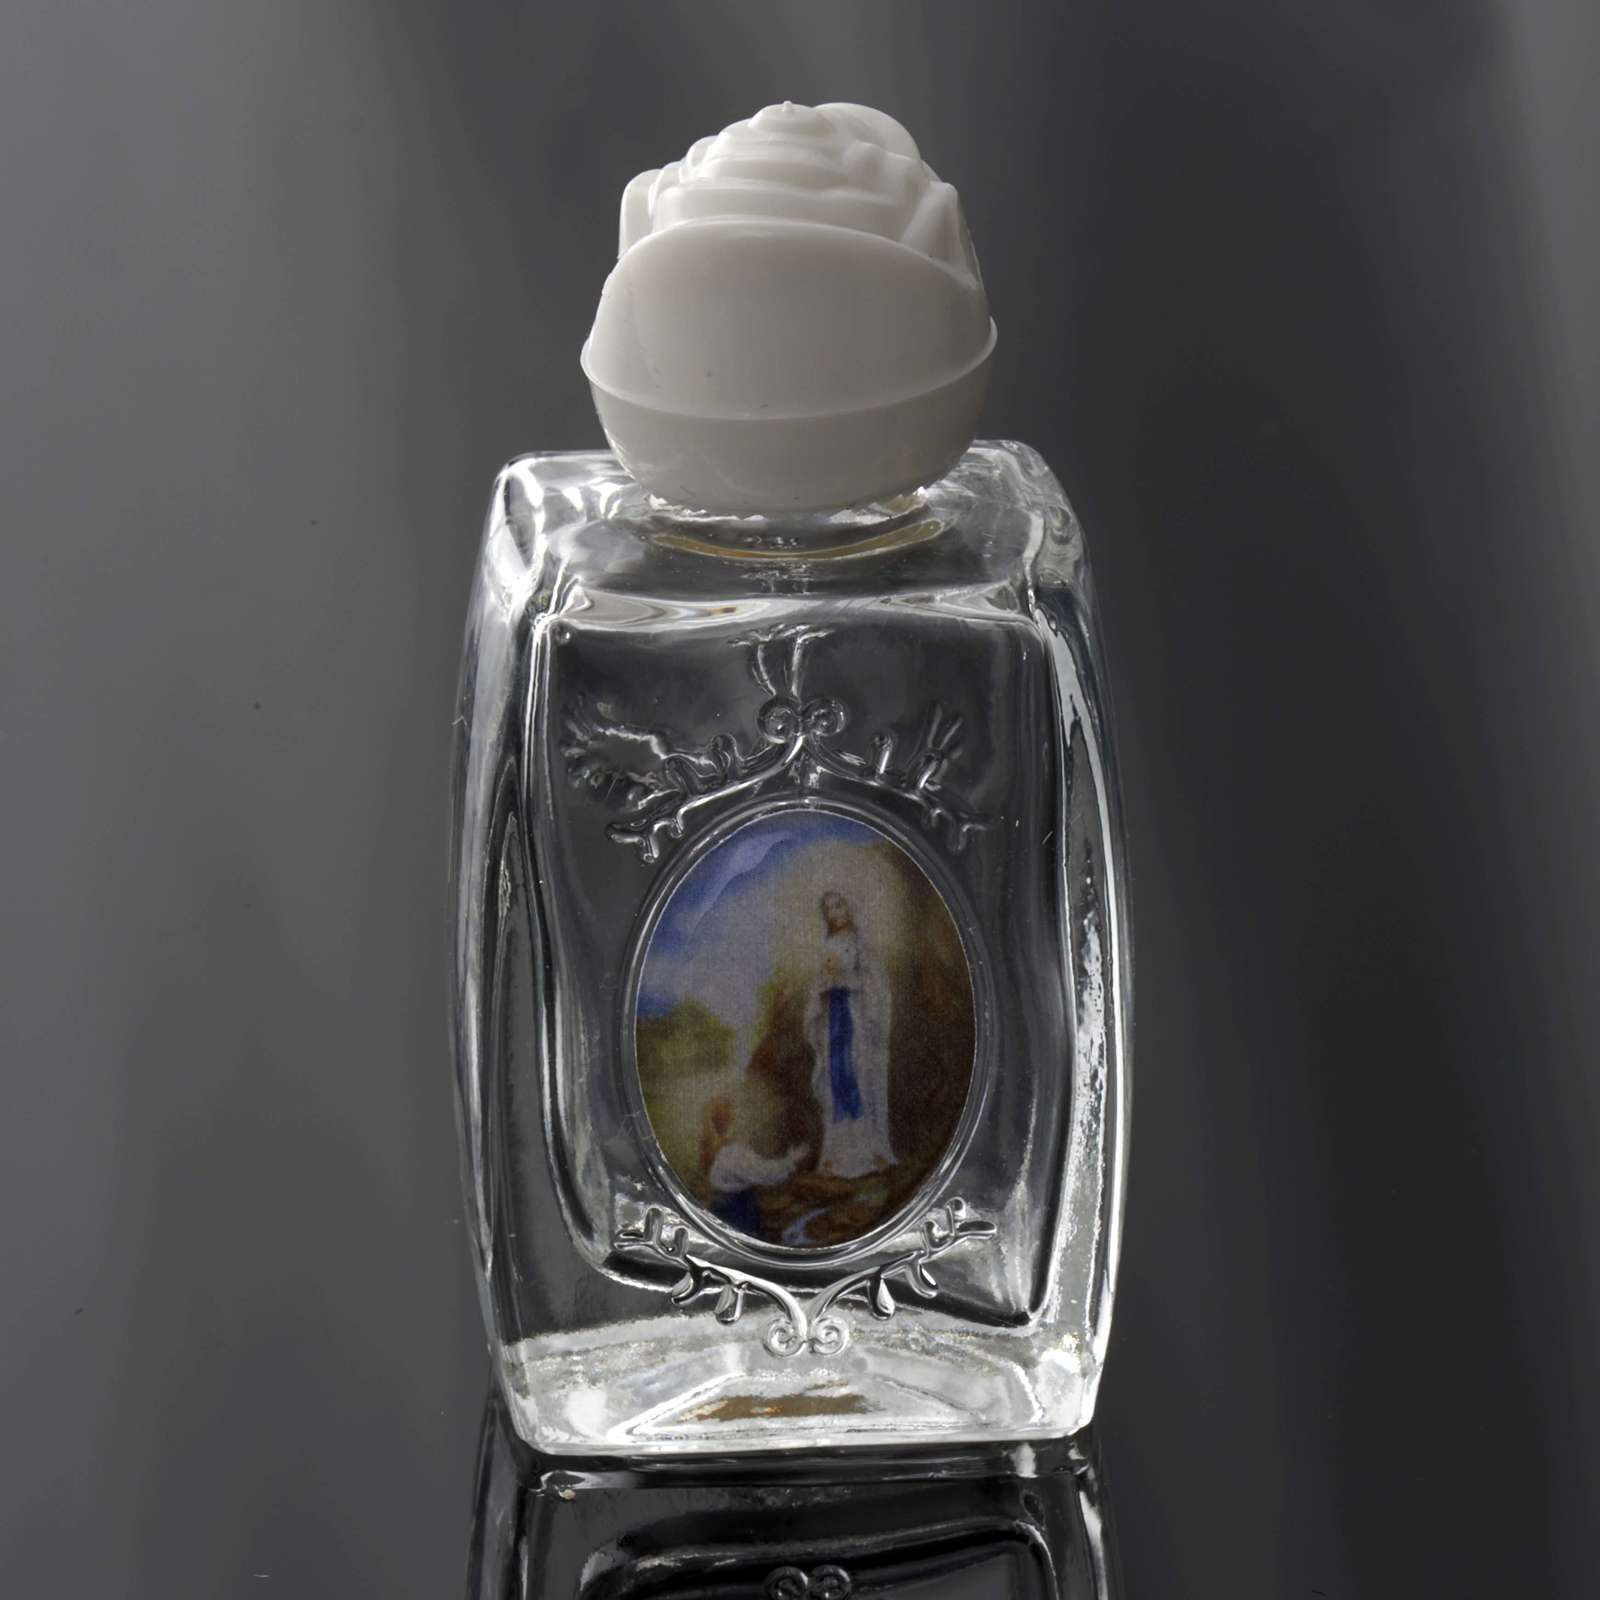 Buteleczka Madonna z Lourdes 3